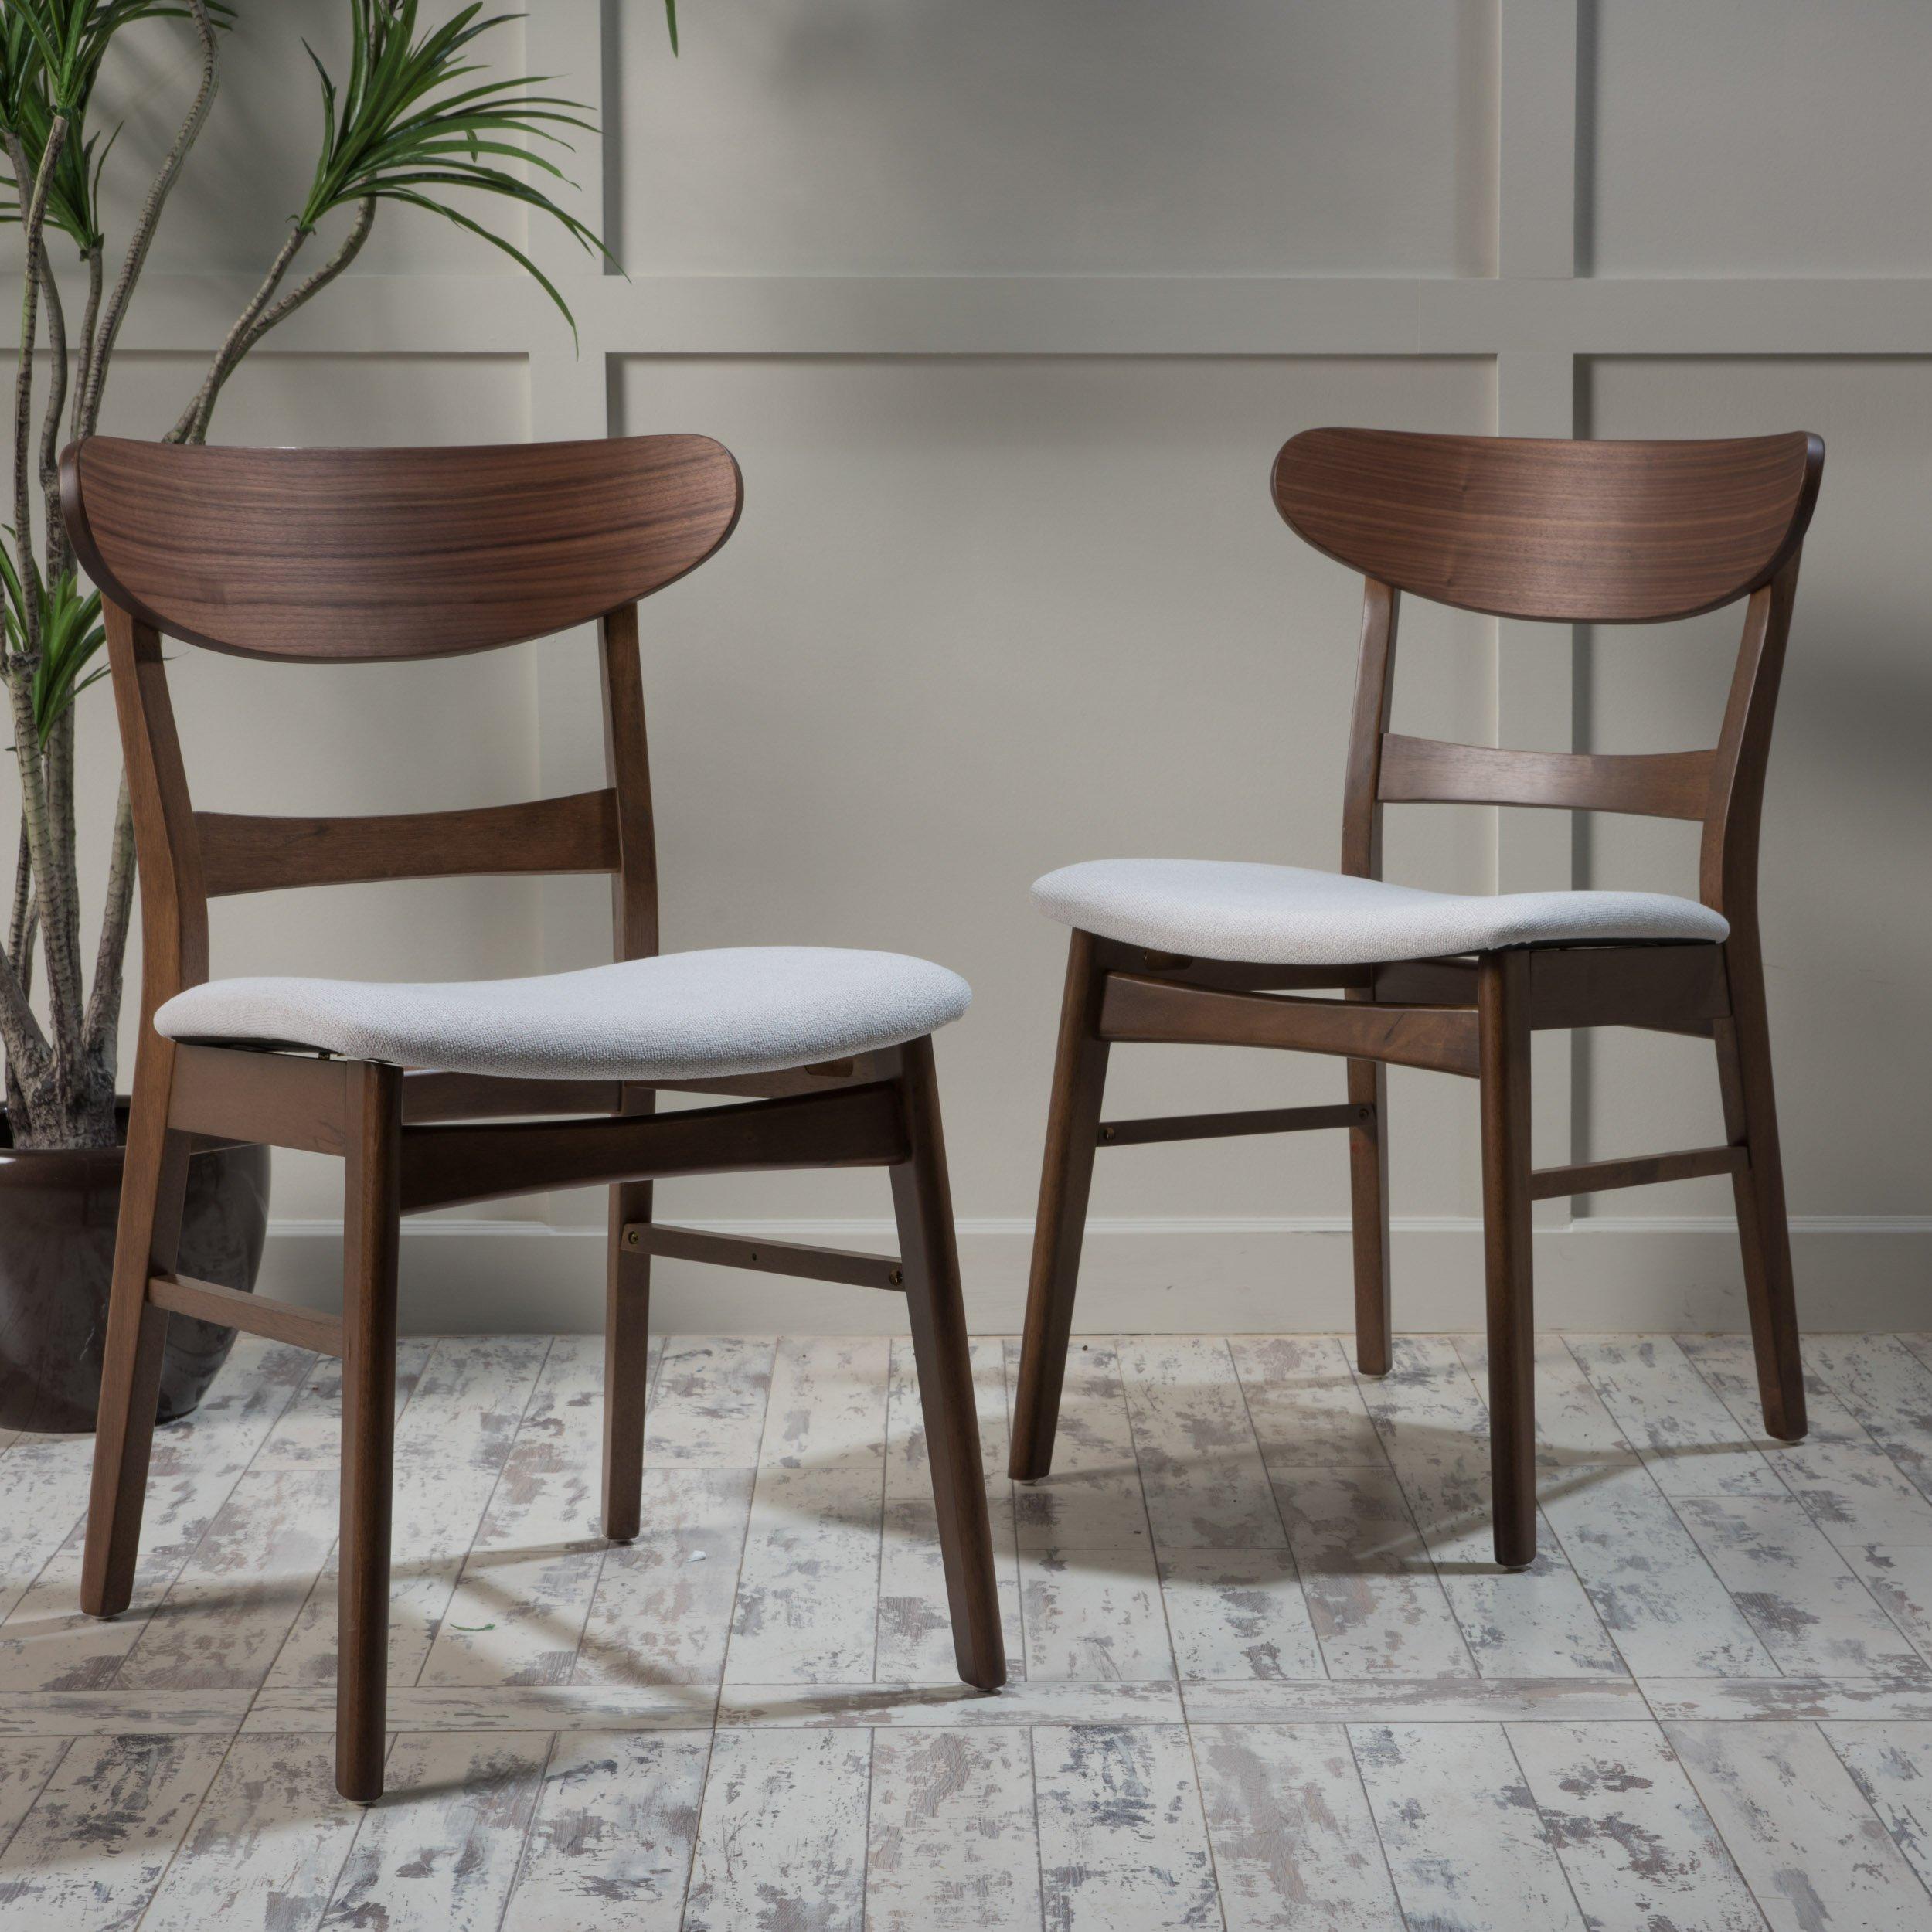 Christopher Knight Home 298972 Idalia Dining Chair Set